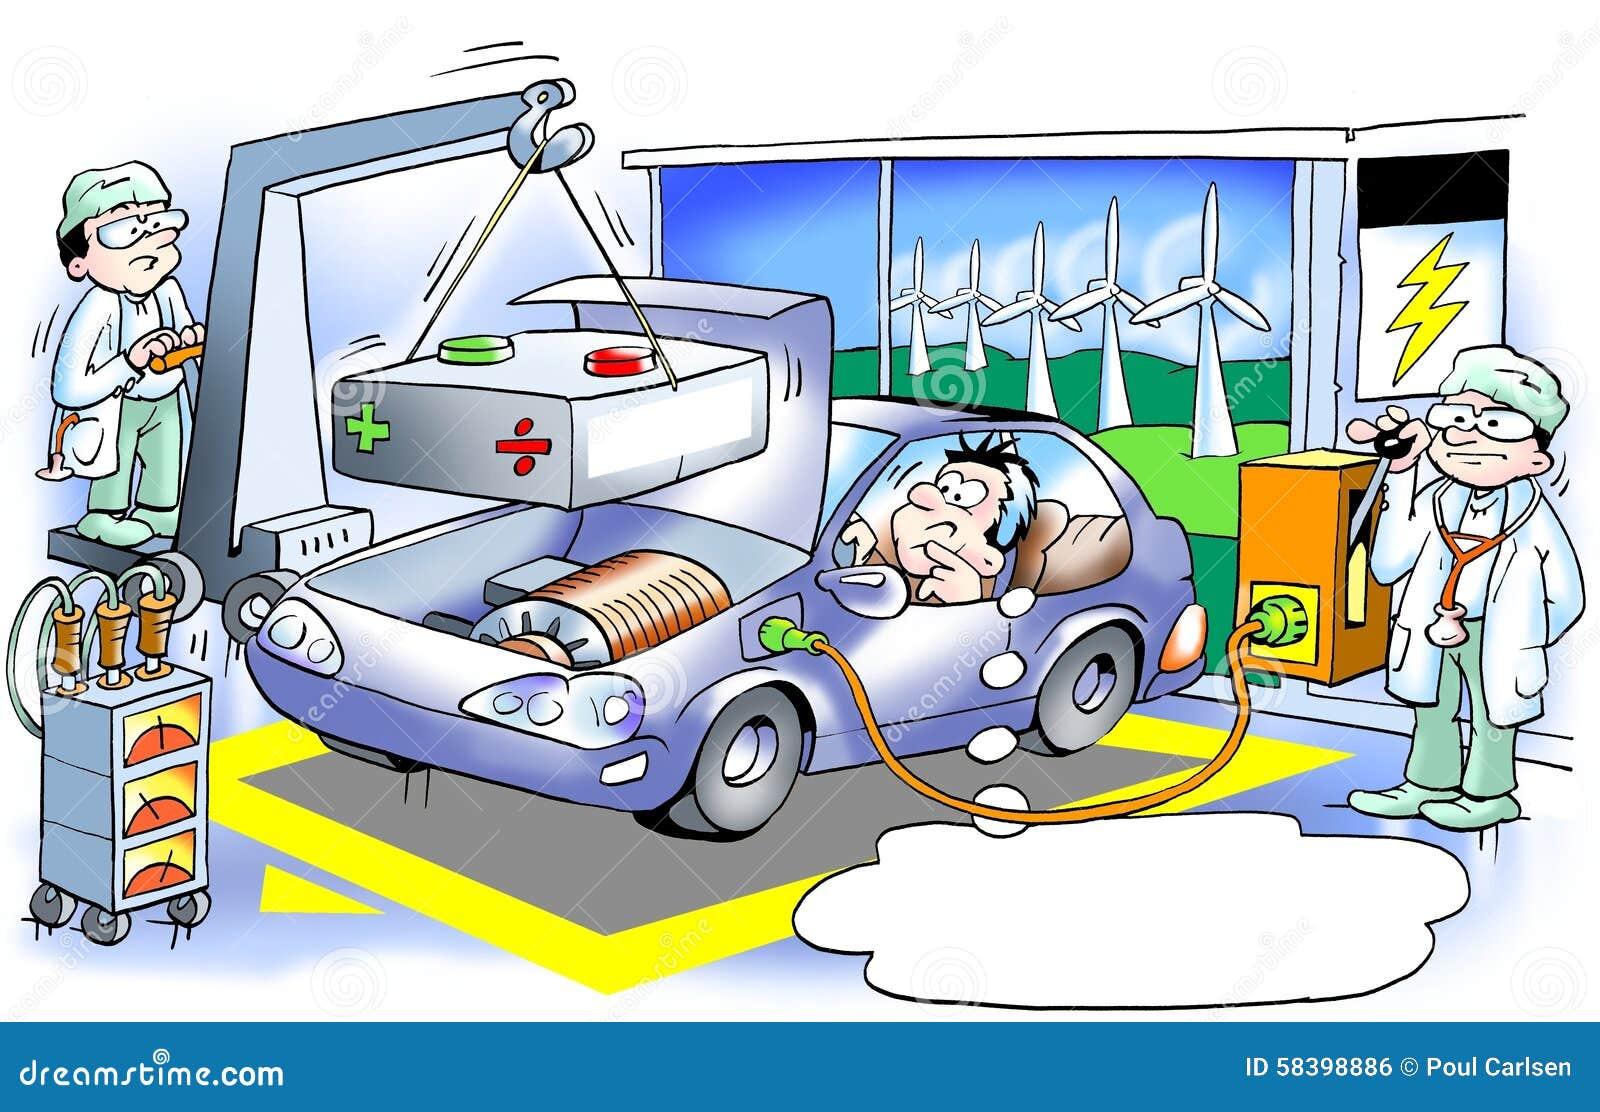 la voiture lectrique obtient d calage une grande batterie lourde illustration stock. Black Bedroom Furniture Sets. Home Design Ideas